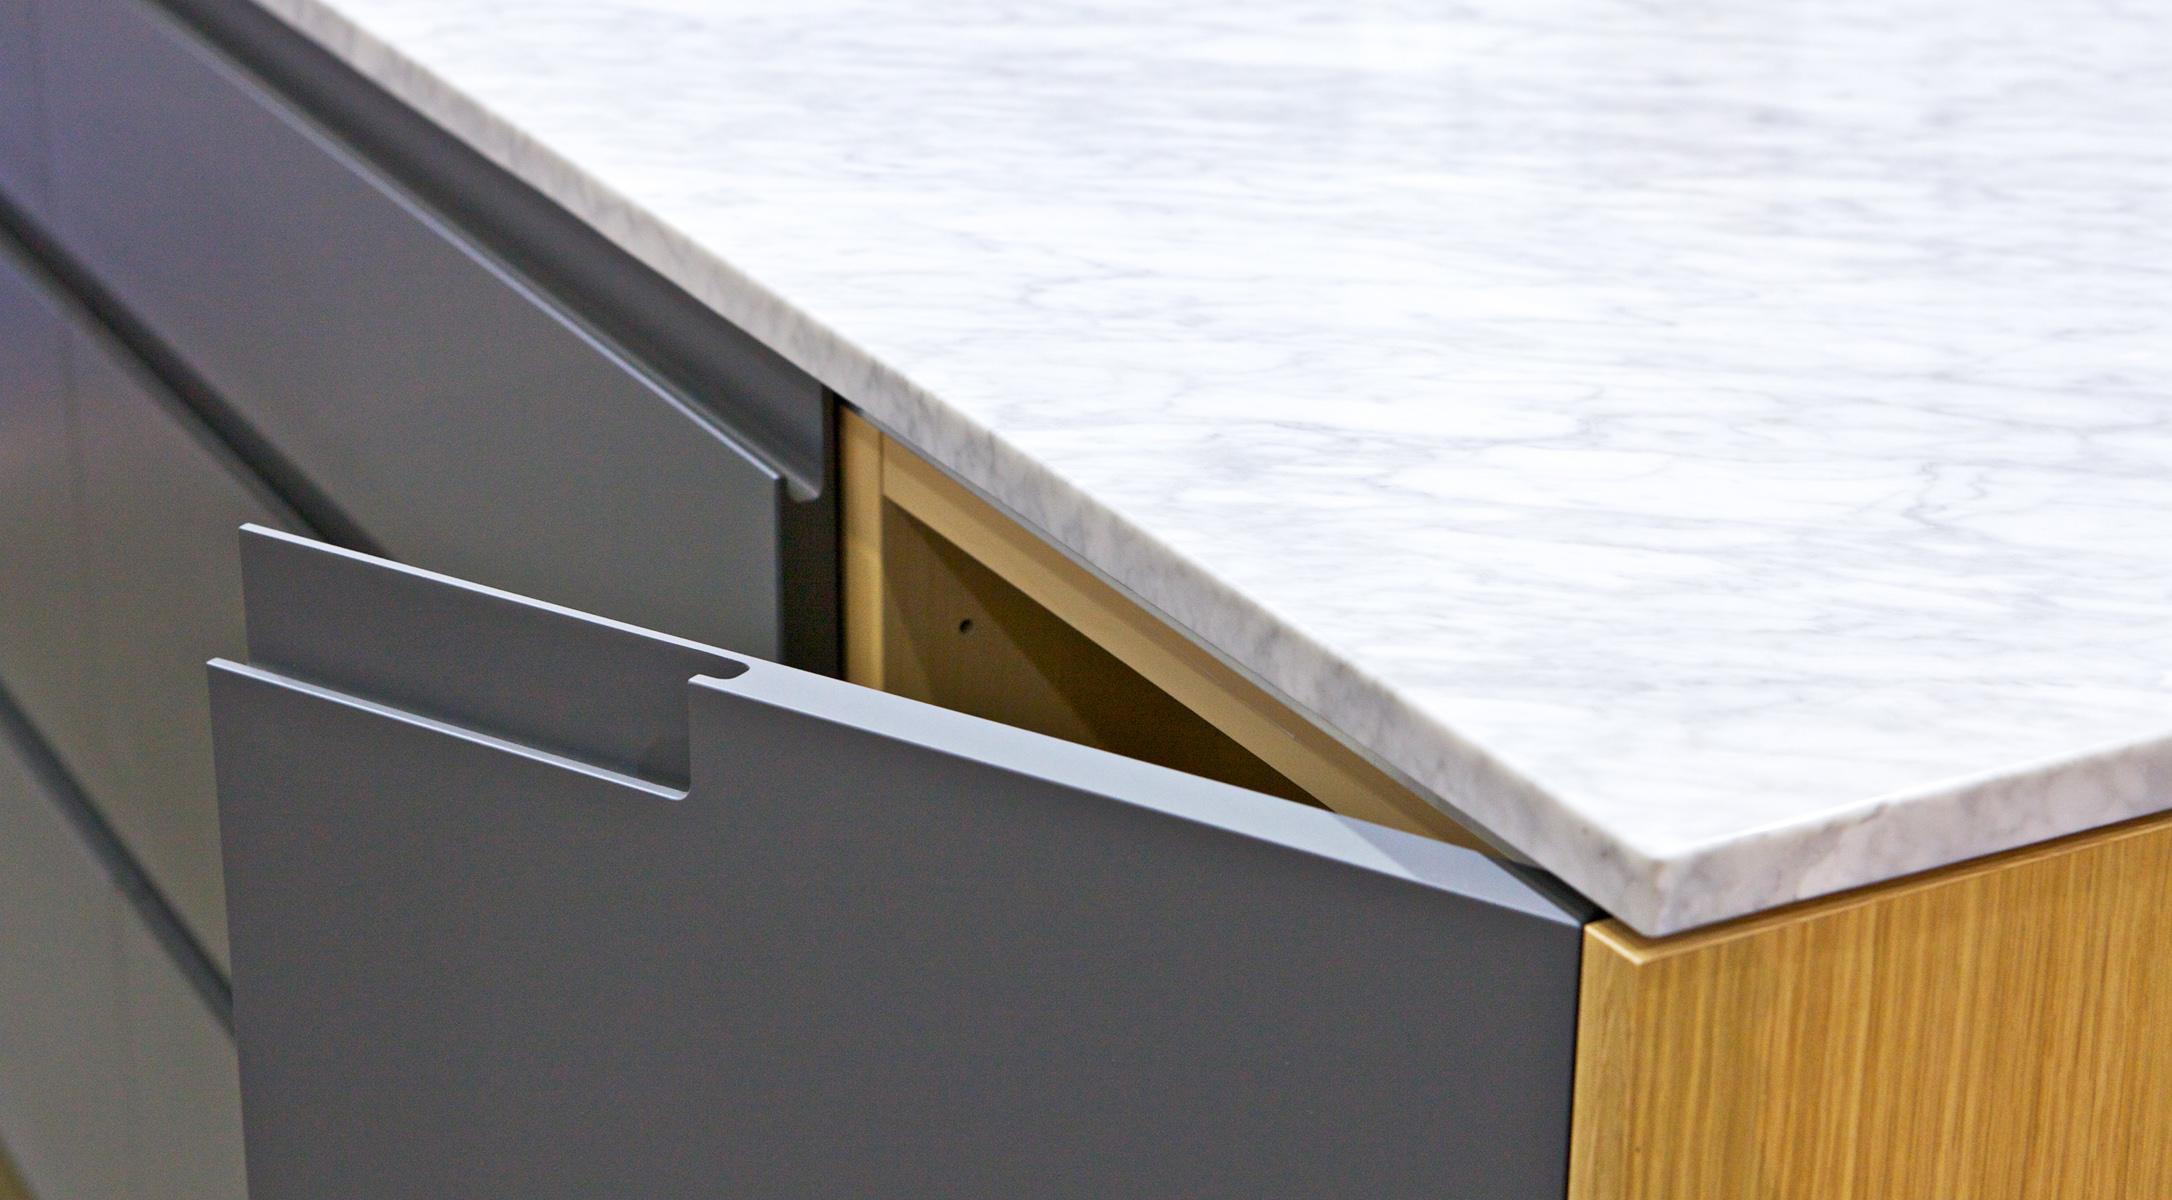 dcabinets custom kitchen cabinet doors custom ikea dark gray Dunsmuir Cabinets dCabinets painted integrated pull oak carrara marble